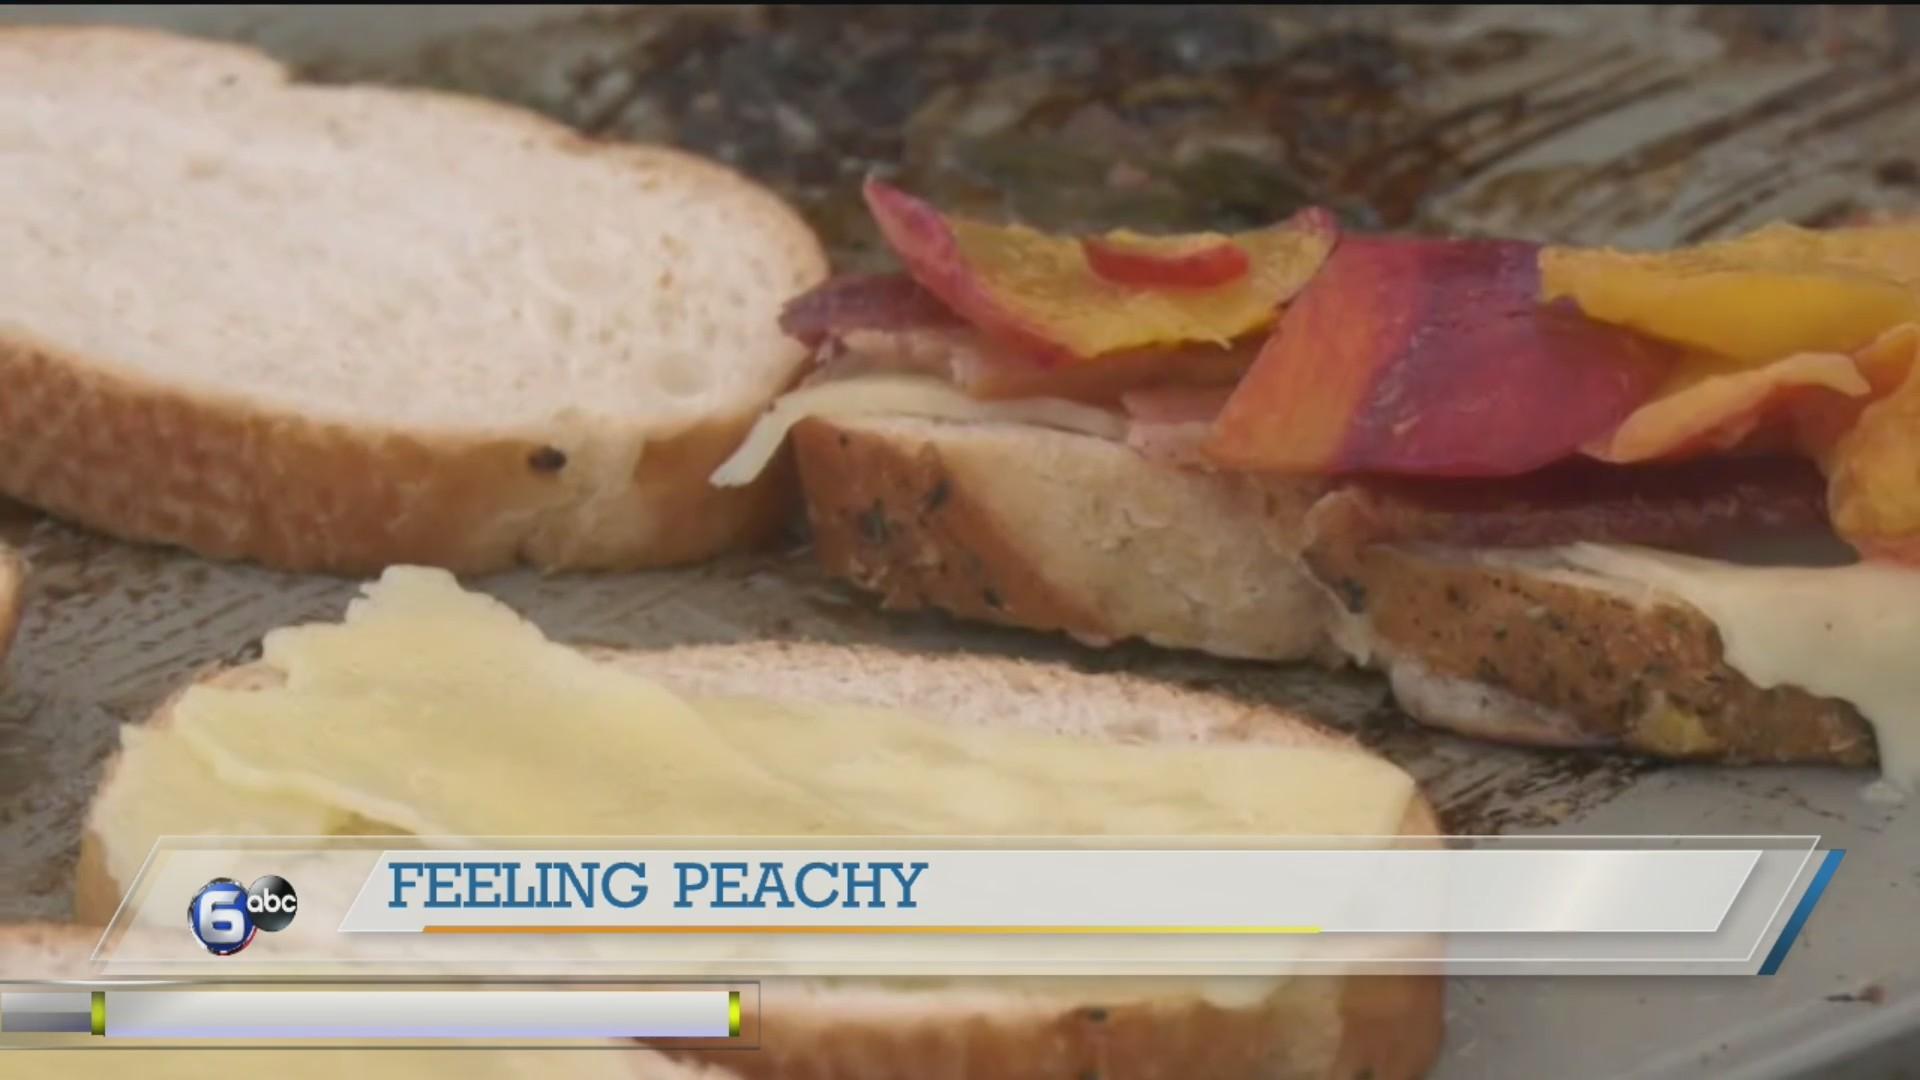 Chef Scott Whittaker cooks up a delicious peach sandwich